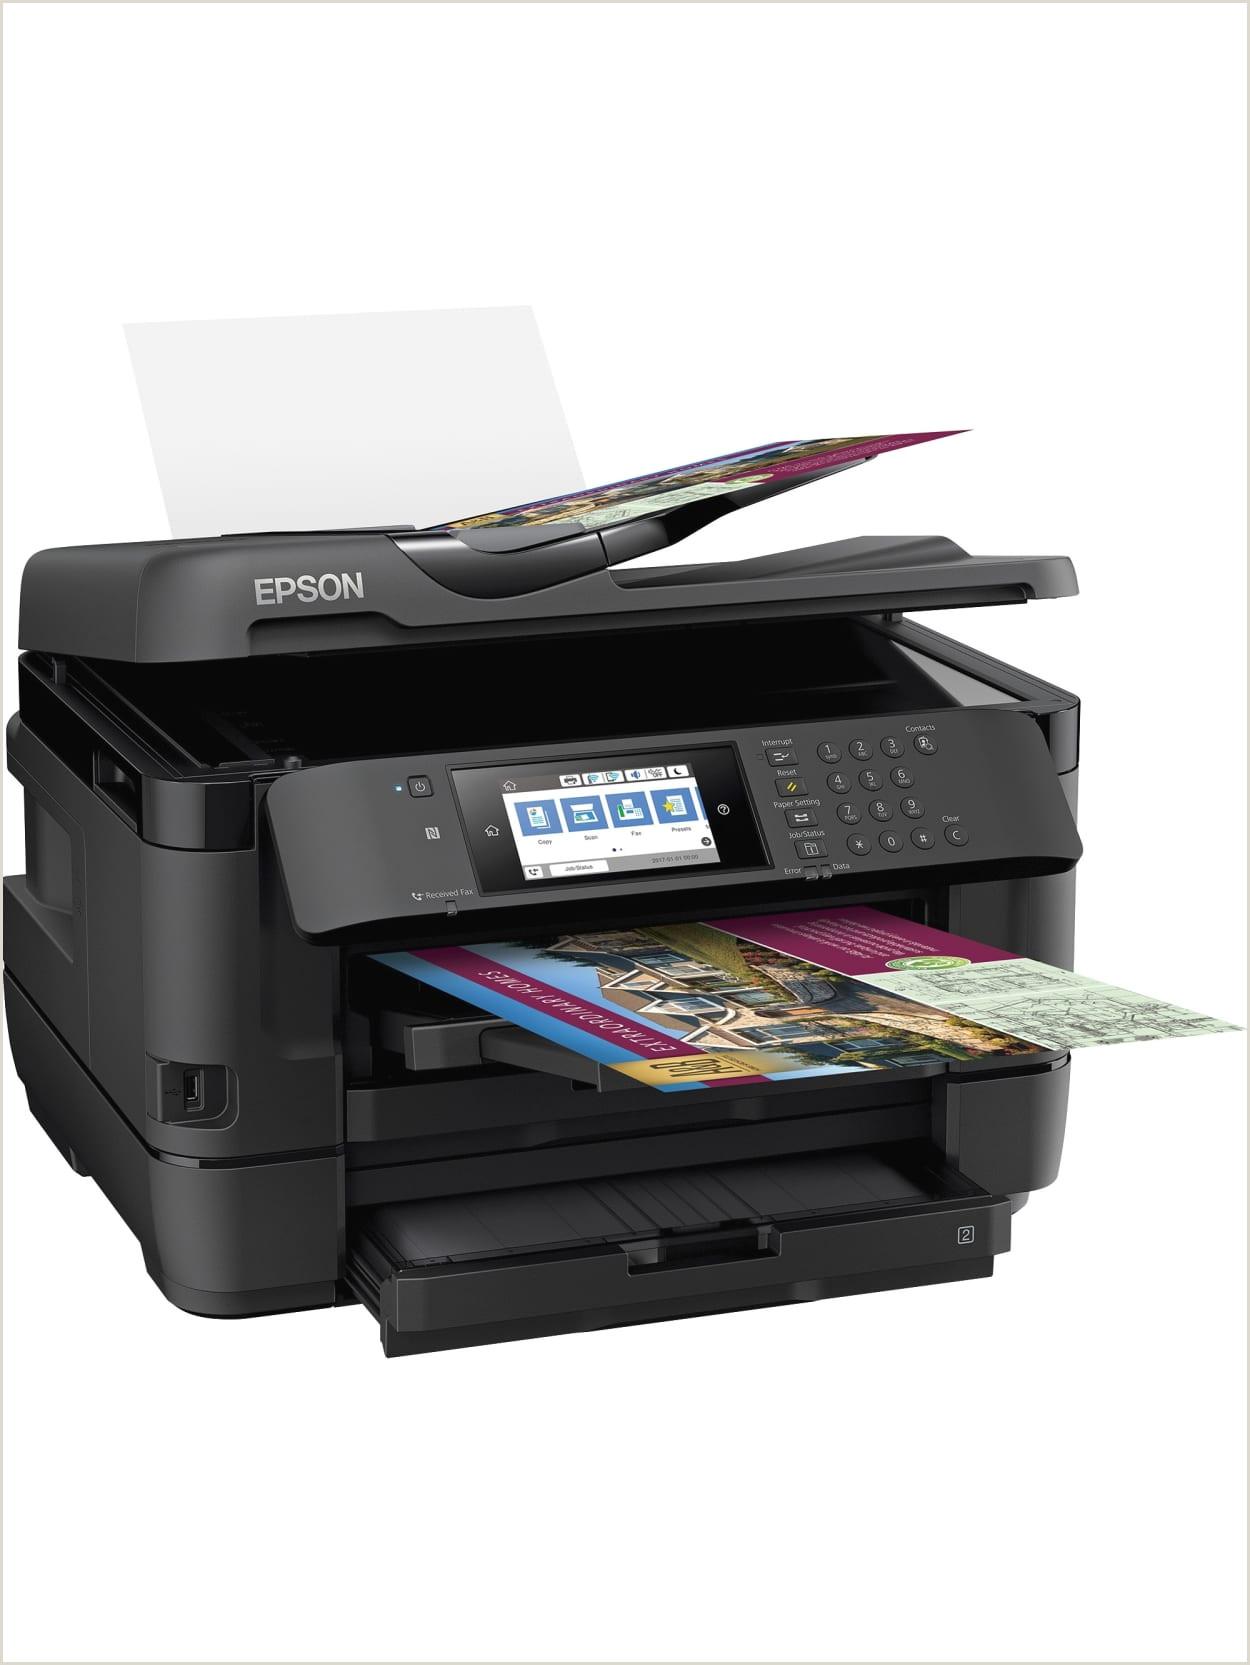 Best Business Cards Printing Online Epson Workforce Wf 7720 19 Wide Format Wireless Inkjet All